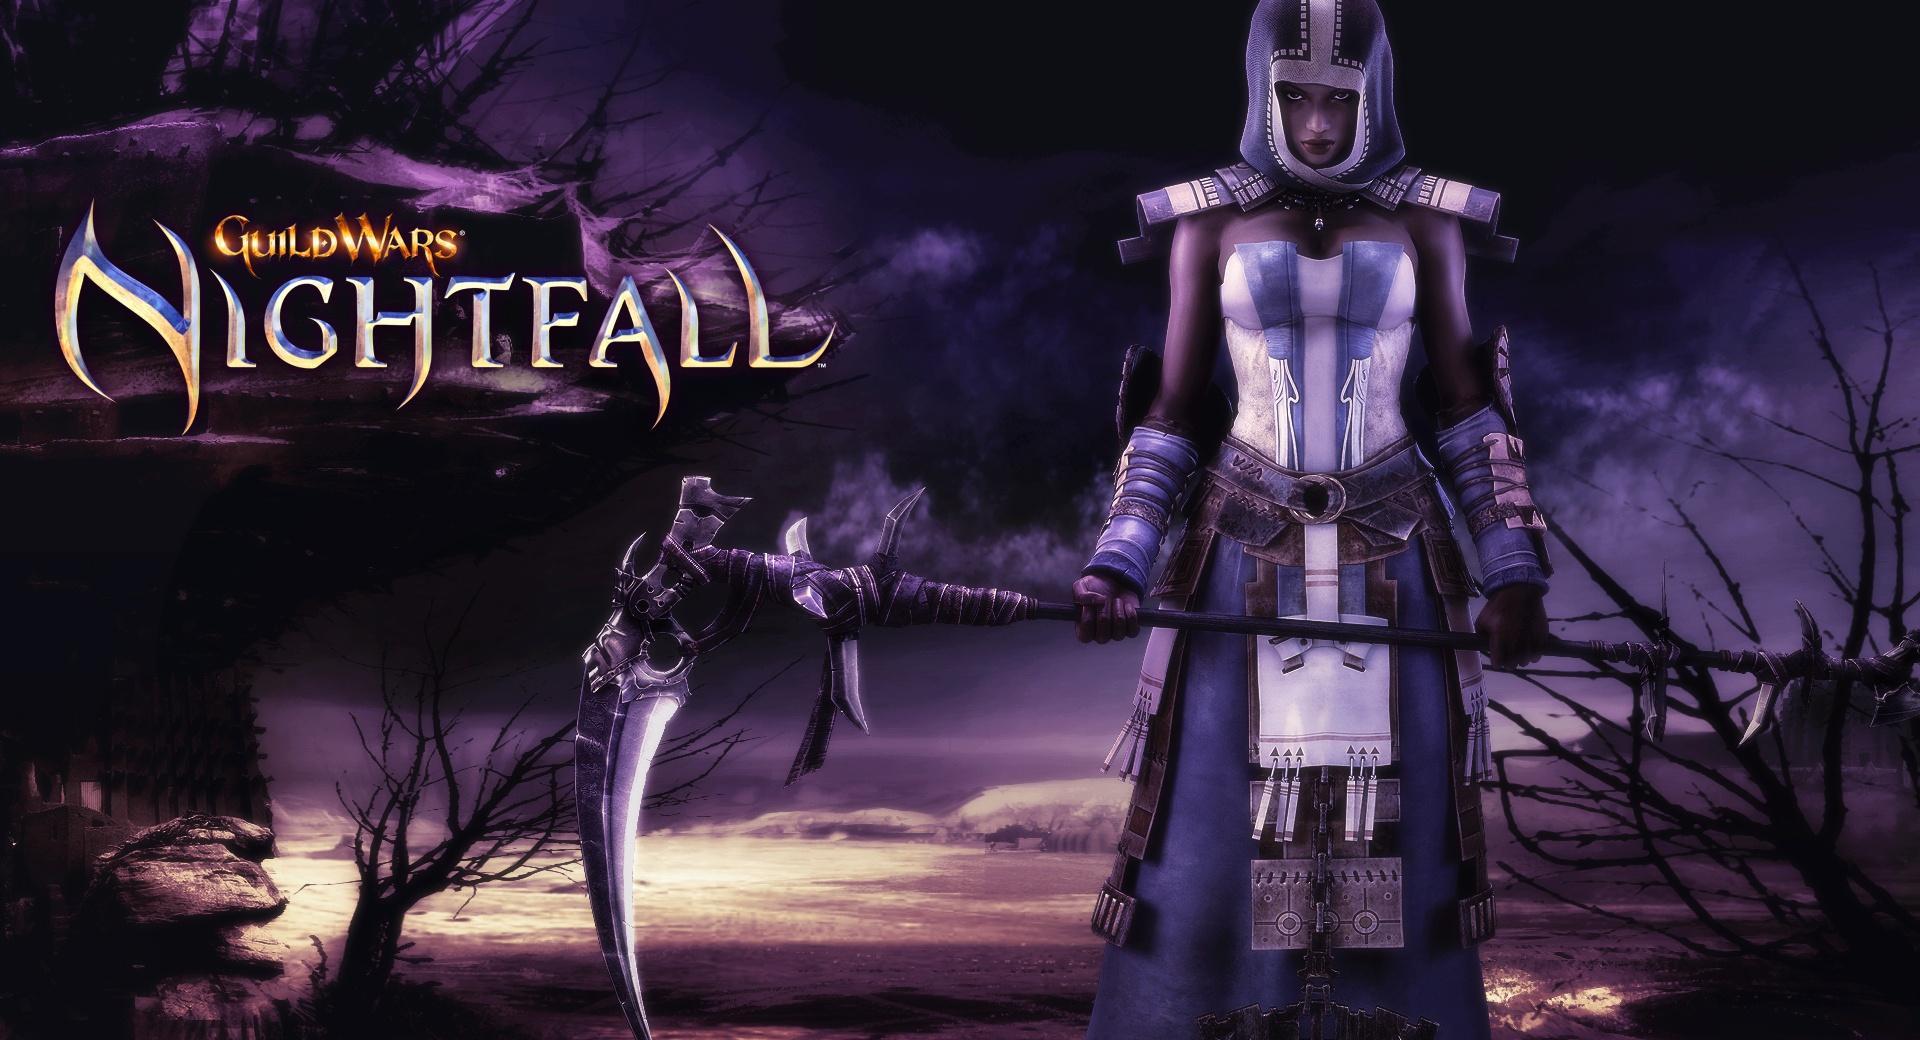 Guild Wars Nightfall - Dervish wallpapers HD quality